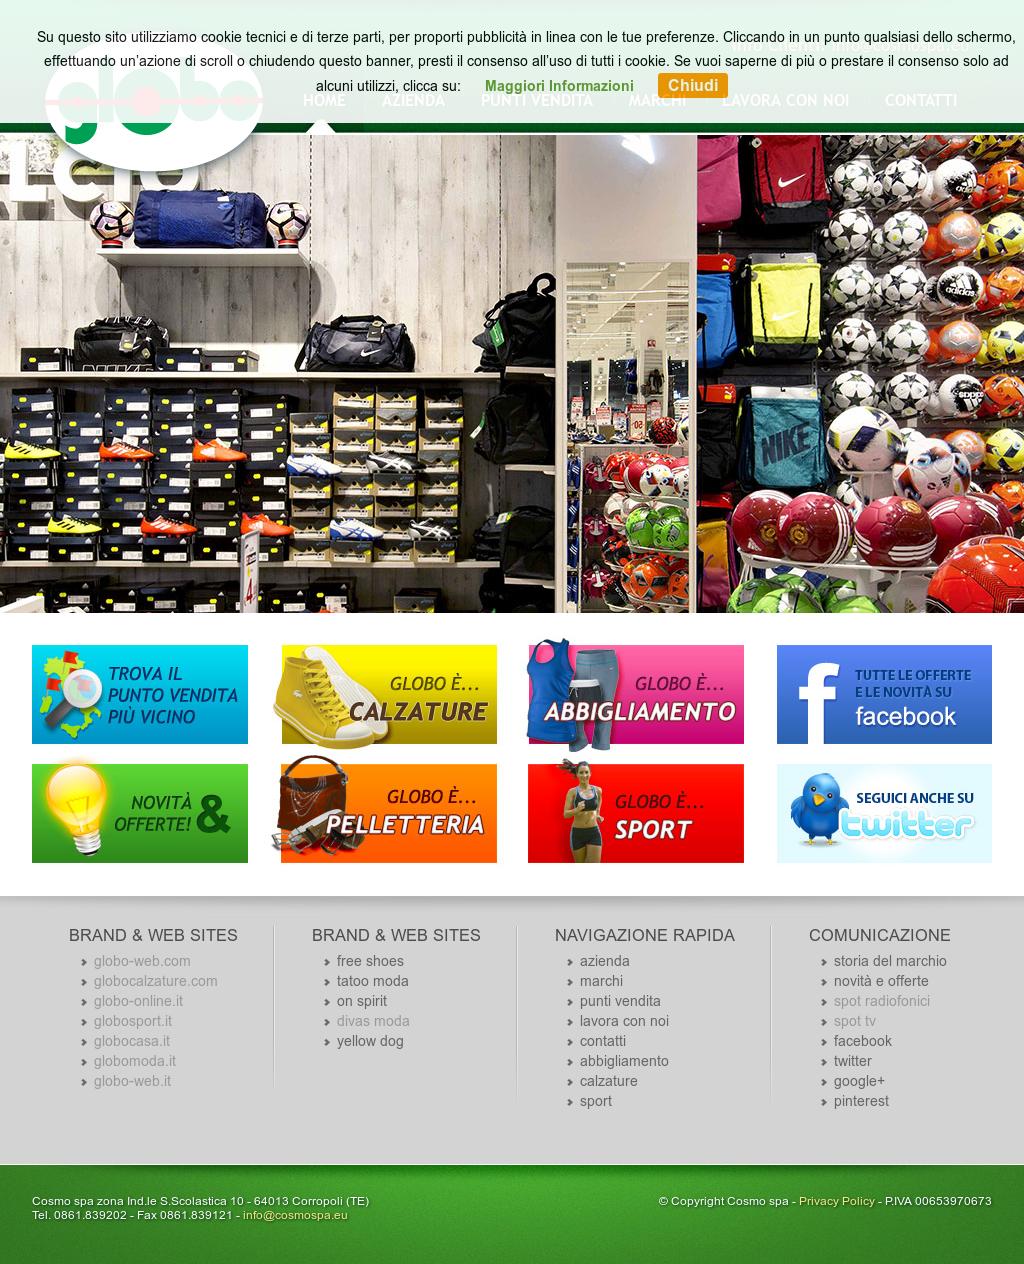 Globomoda Competitors, Revenue and Employees - Owler Company